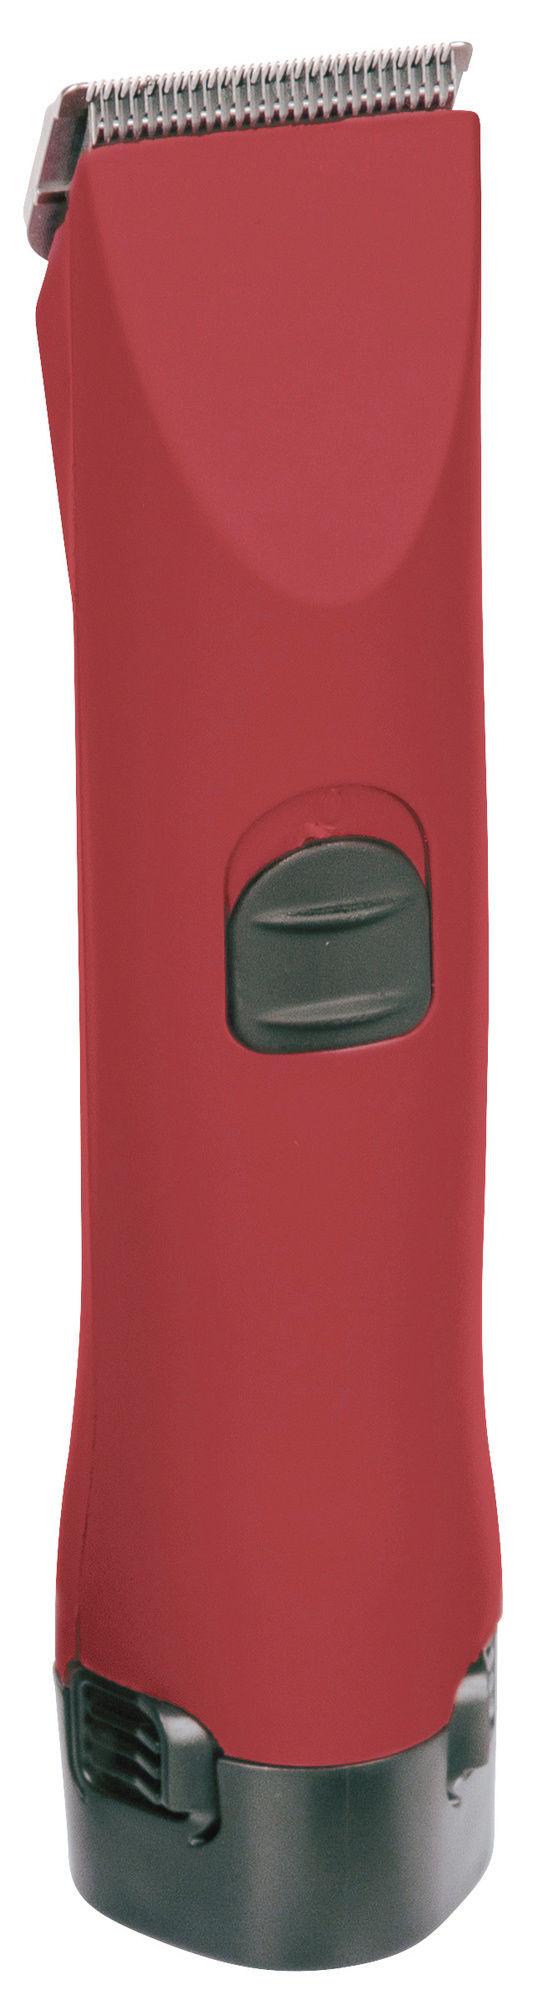 Akku-Schermaschine PROFI inkl. Messer 18281